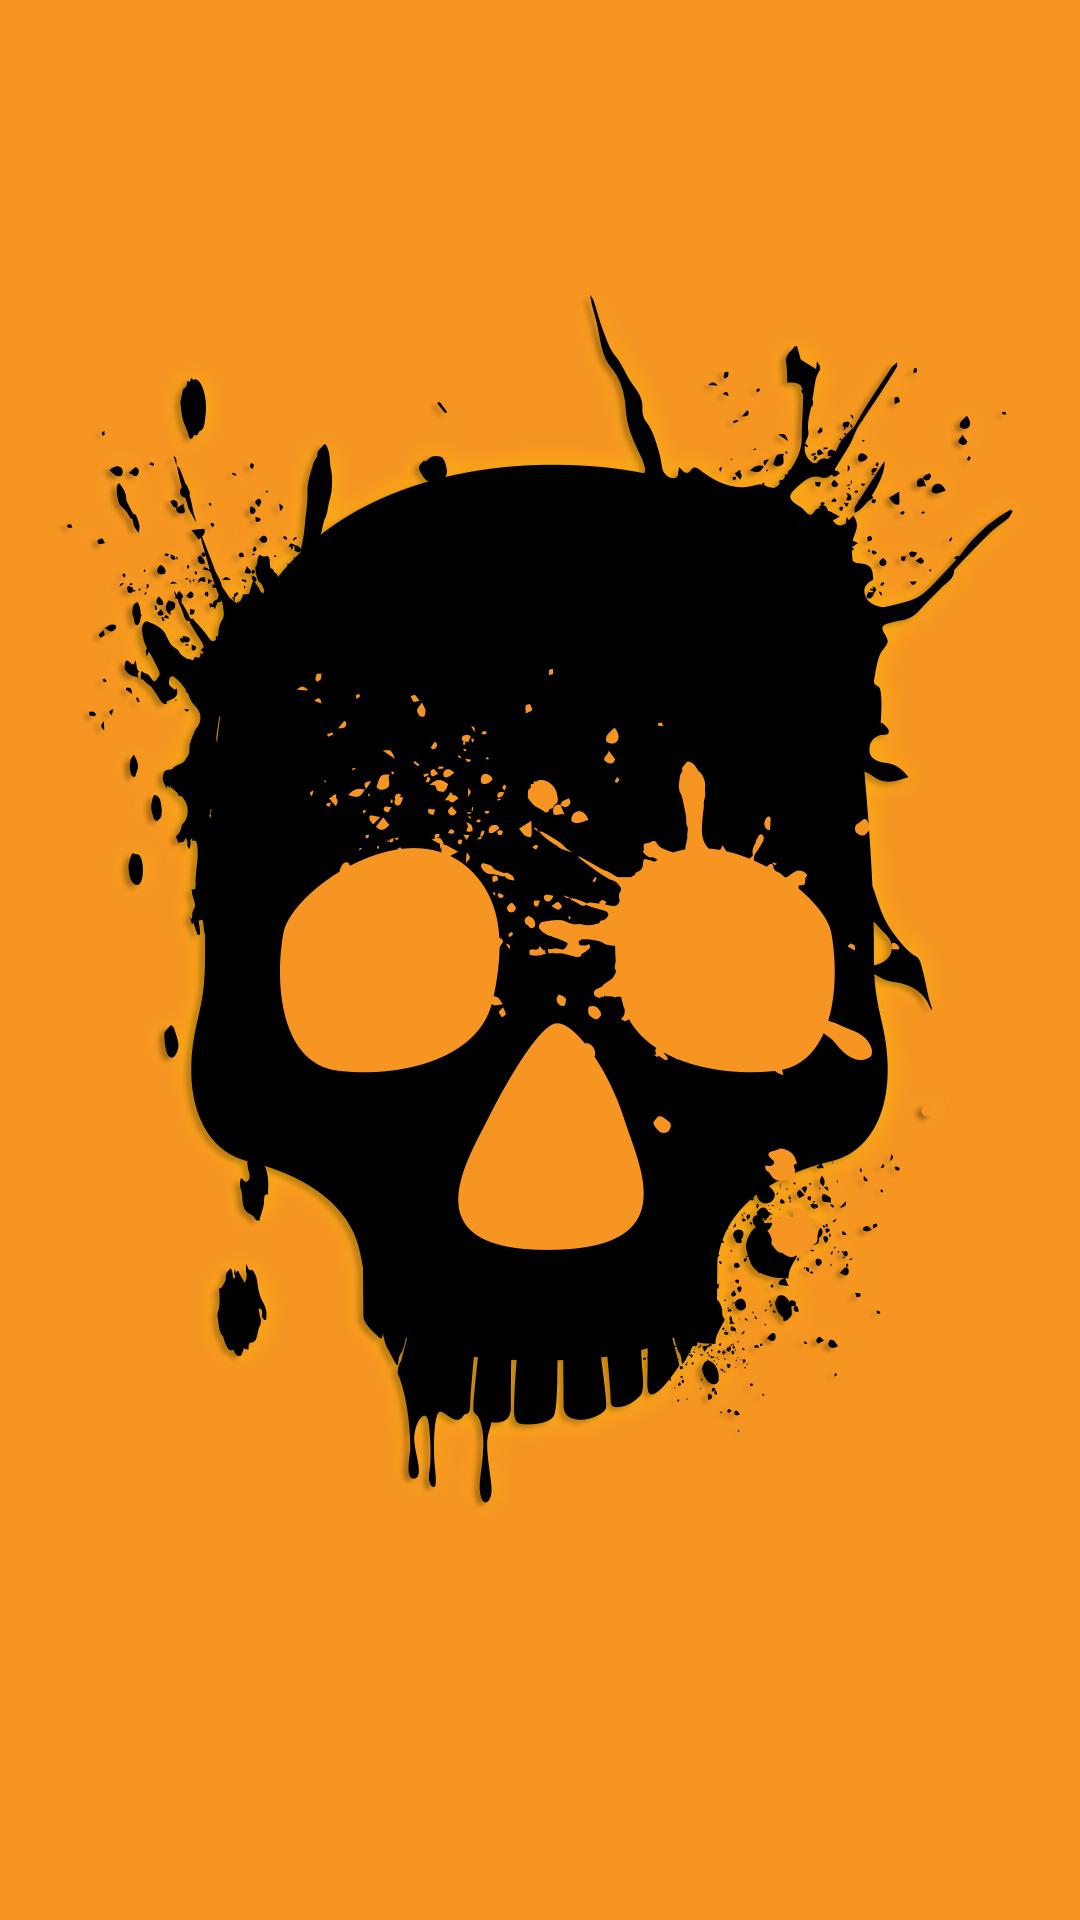 wasted-skull-4638